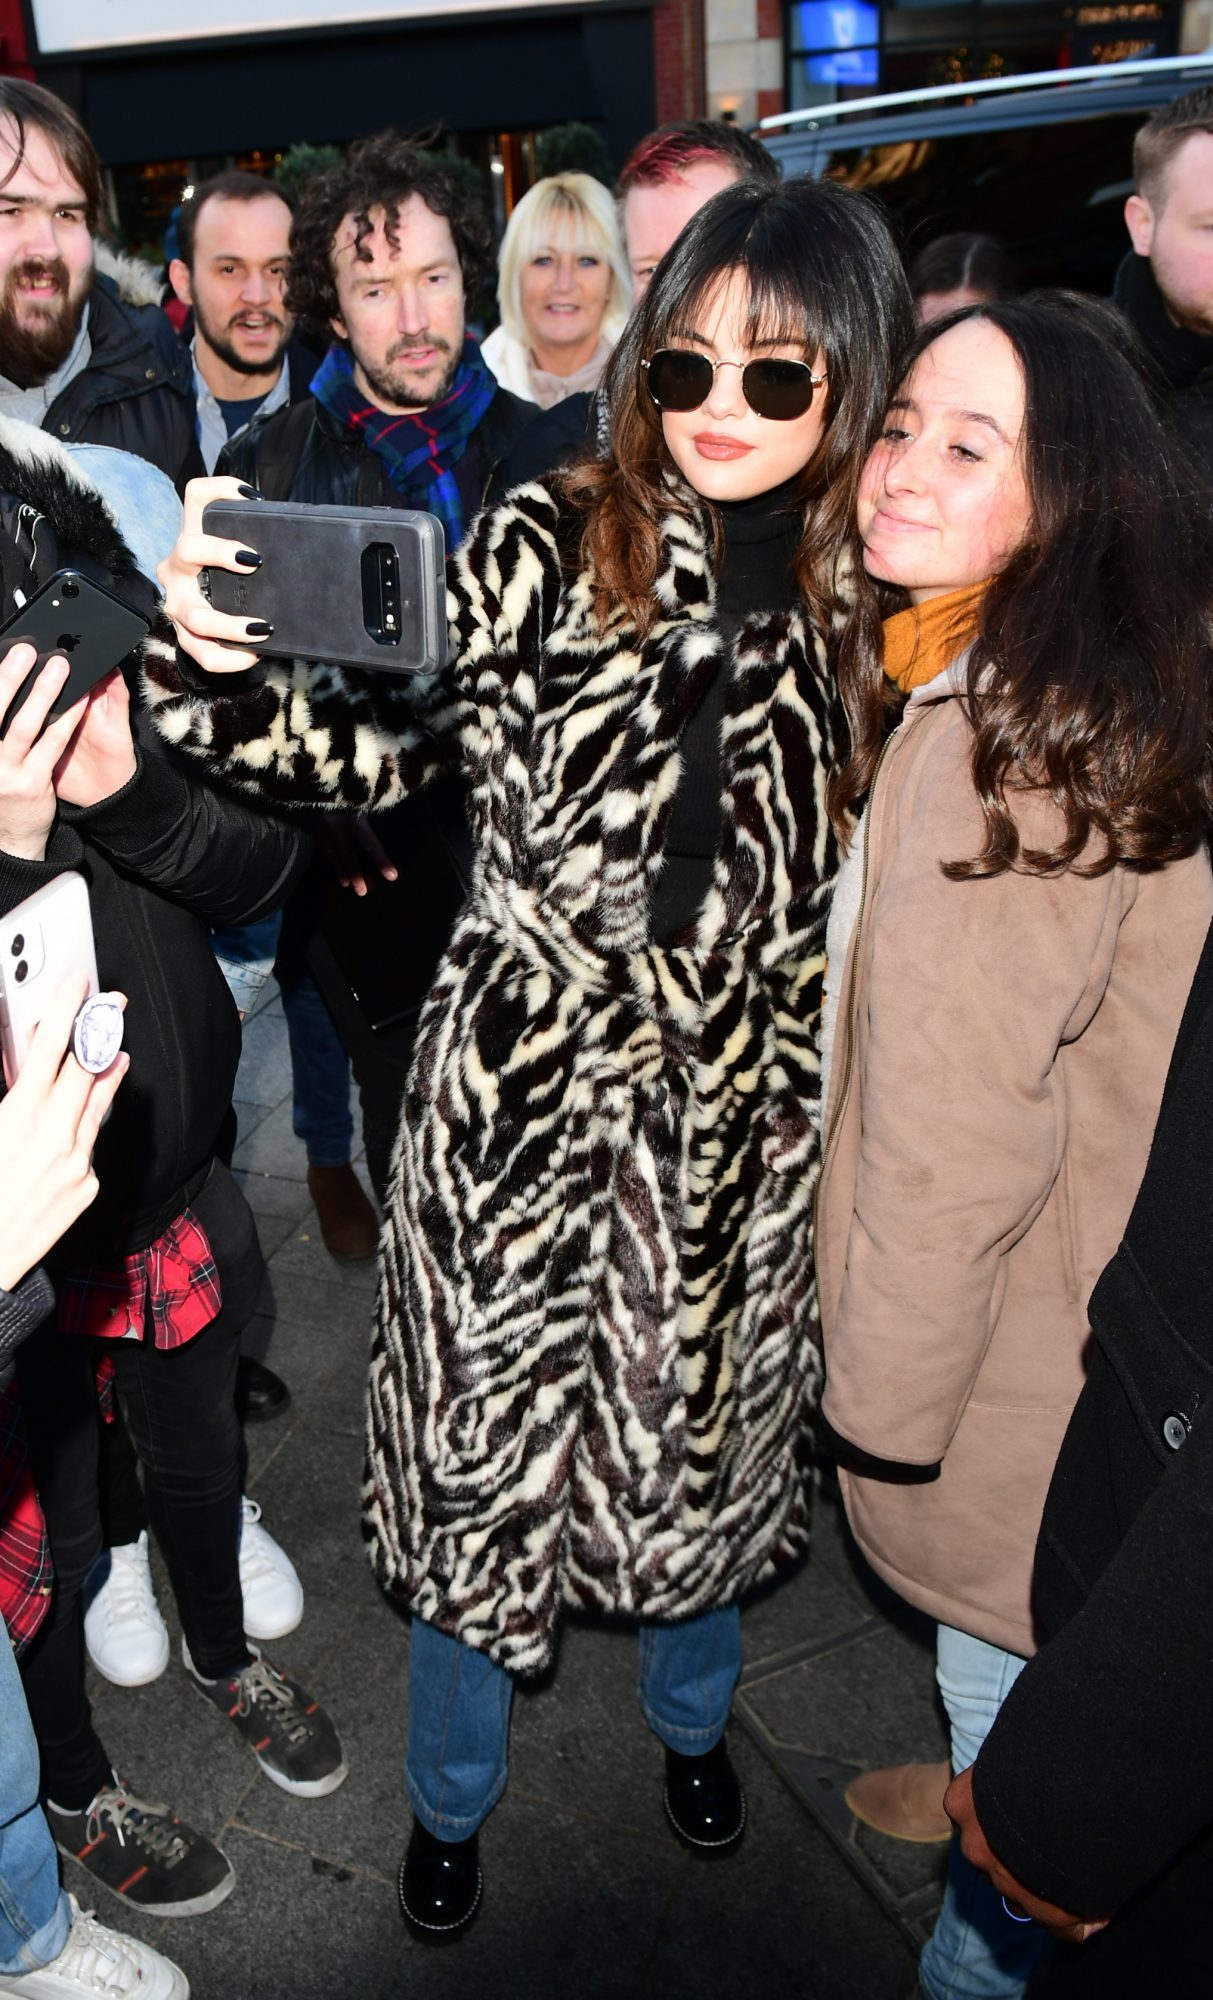 Selena Gomez Looks Fashionable in Animal Print Coat as She Greet